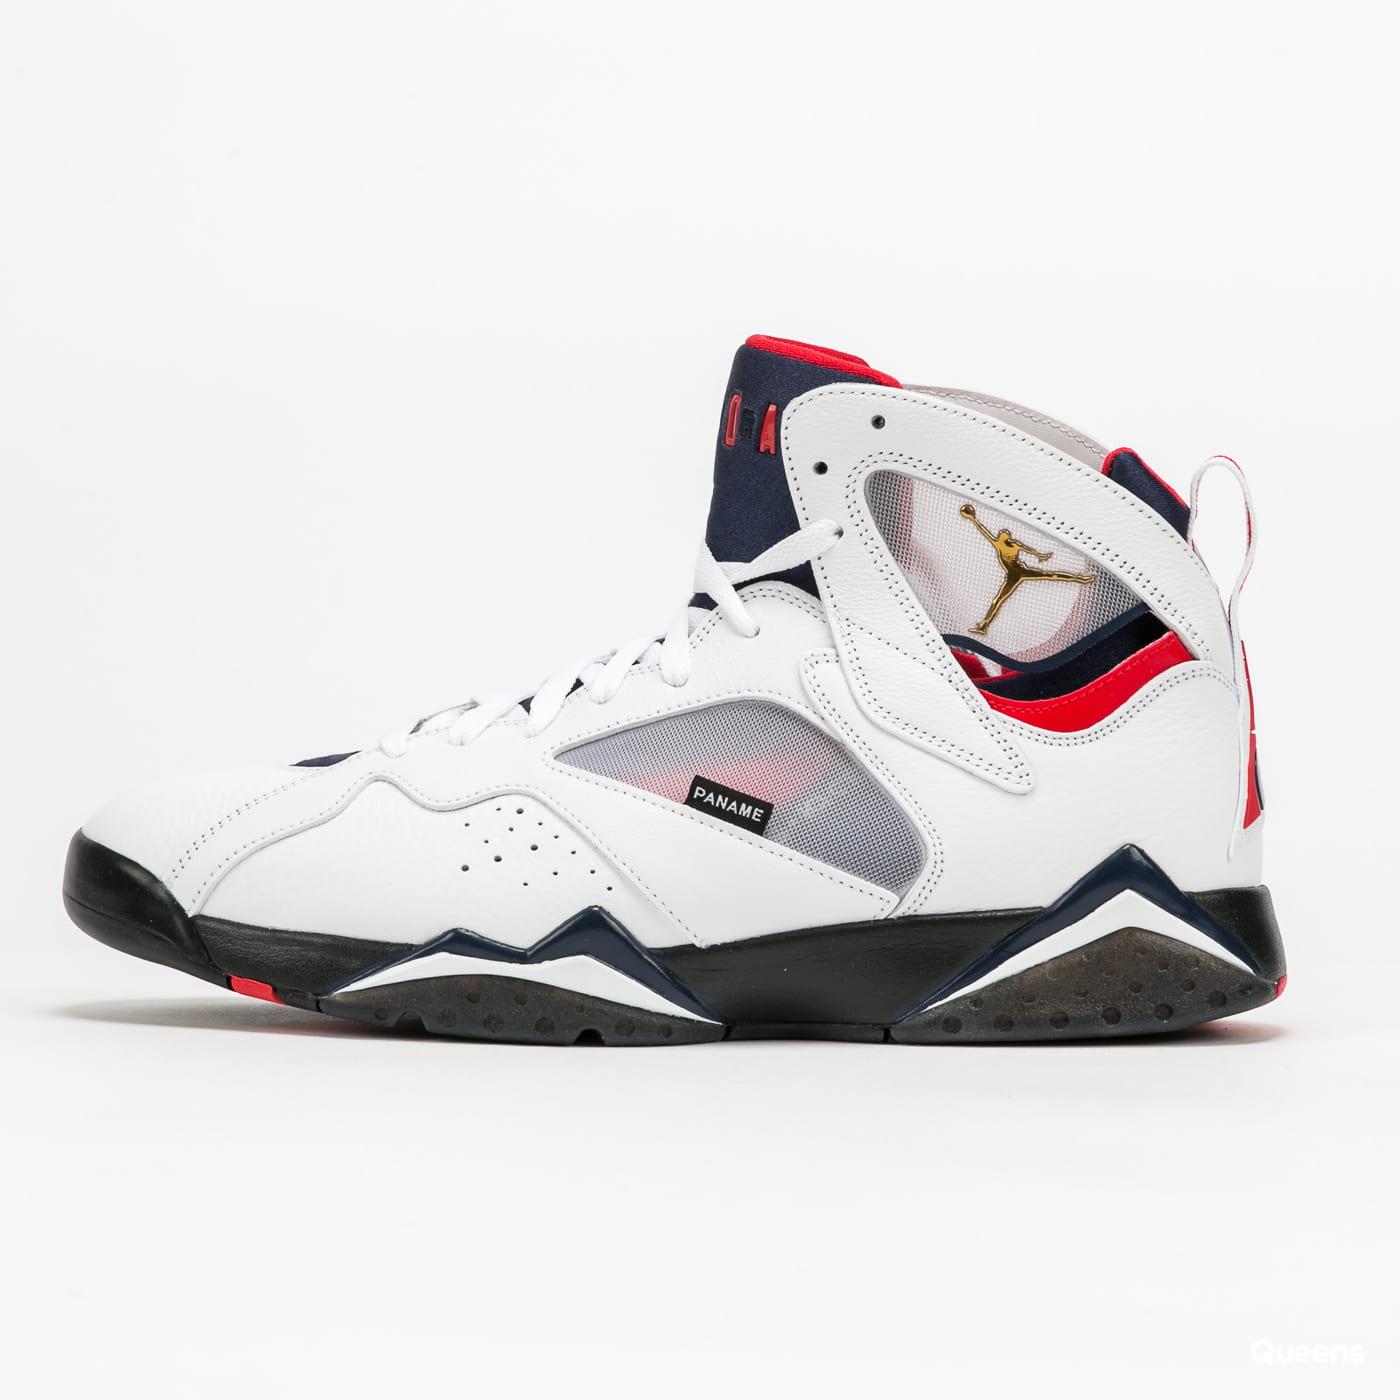 Jordan Air Jordan 7 Retro BCFC white / university red